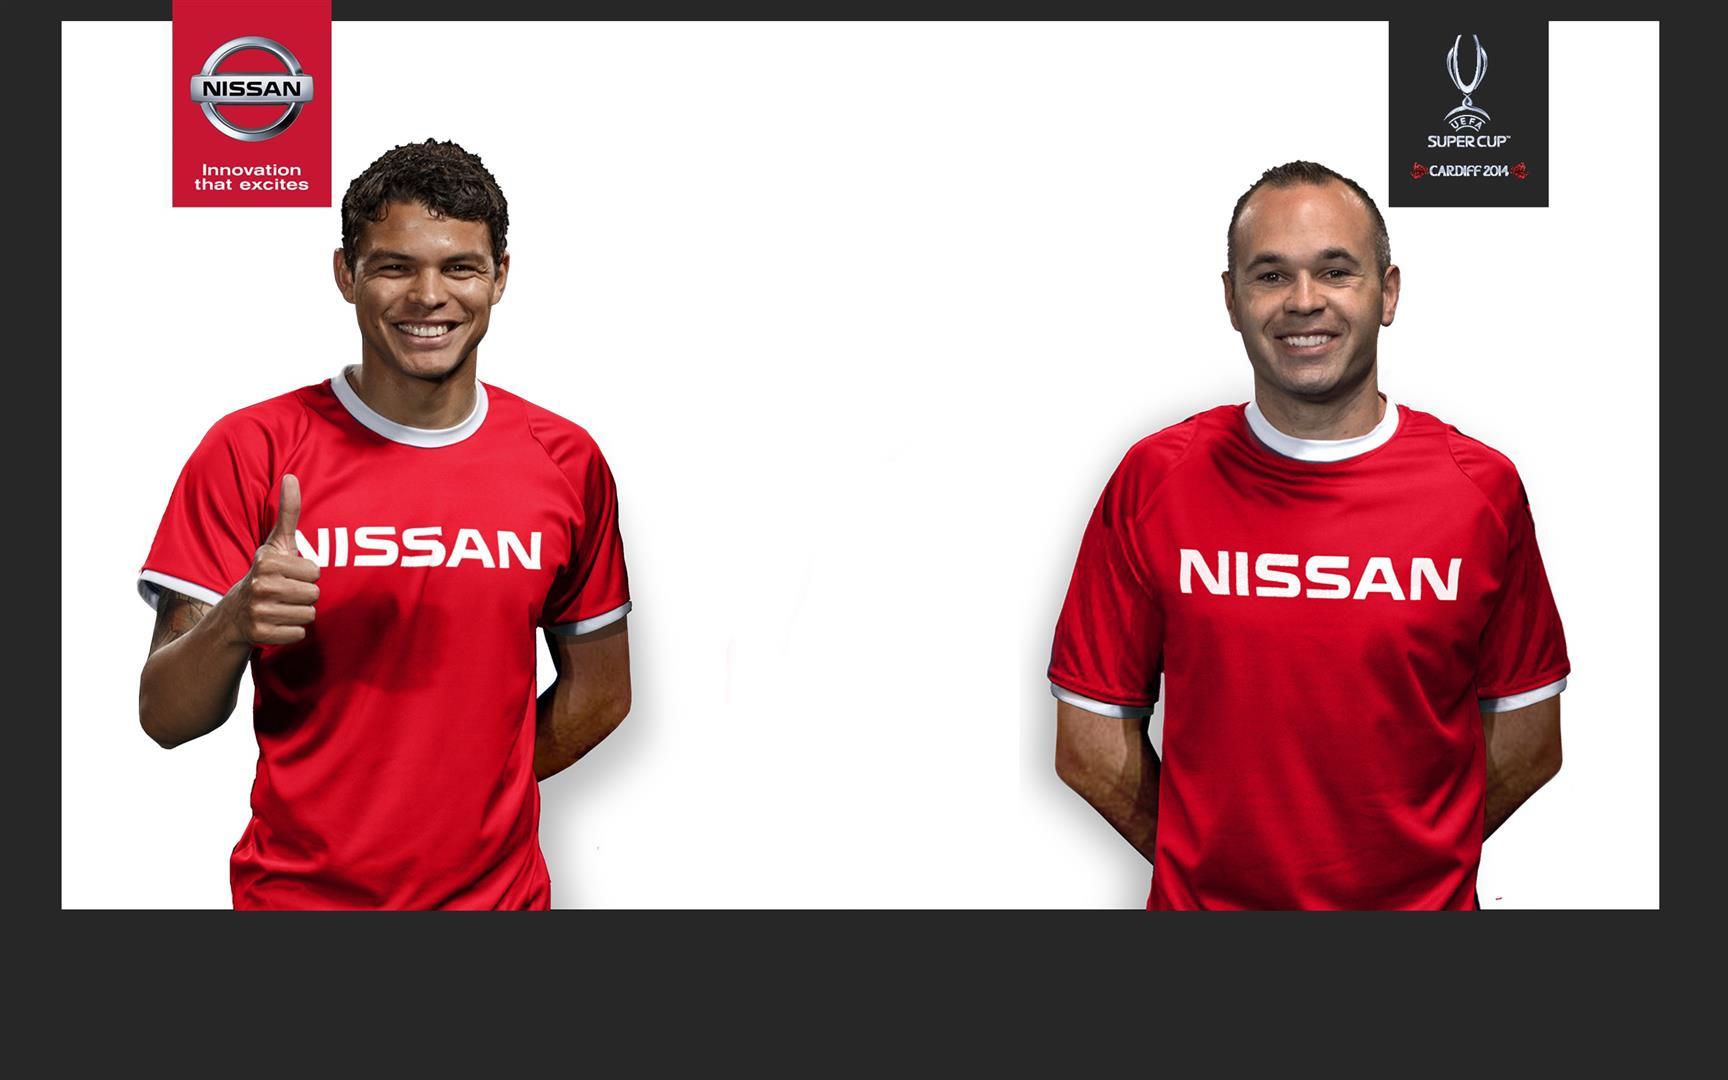 Nissan UEFA Champions League Sponsorship